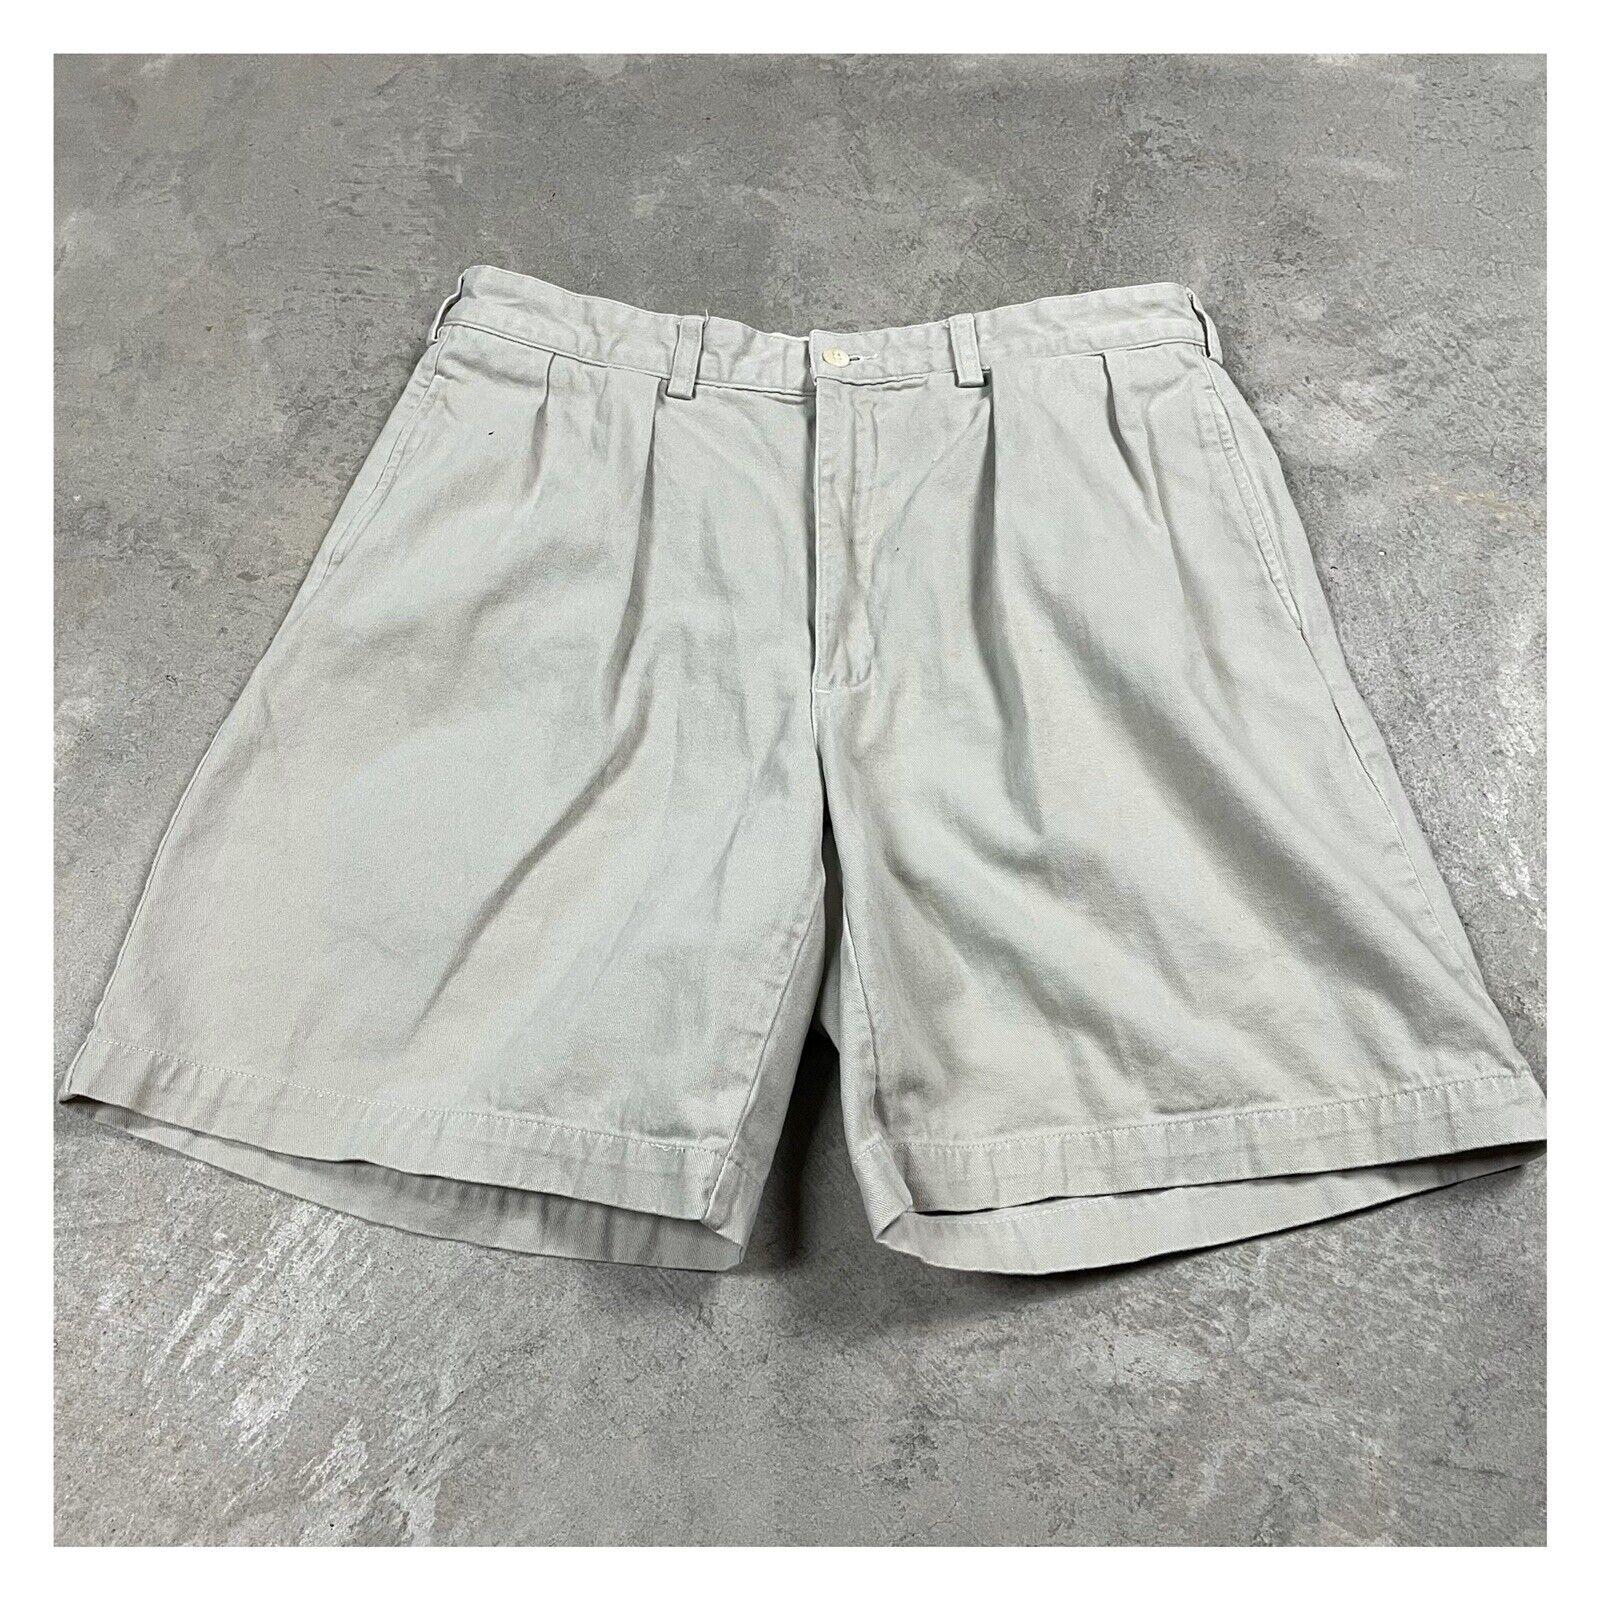 90s VTG POLO RALPH LAUREN Shorts 35 34 Waist Chin… - image 1